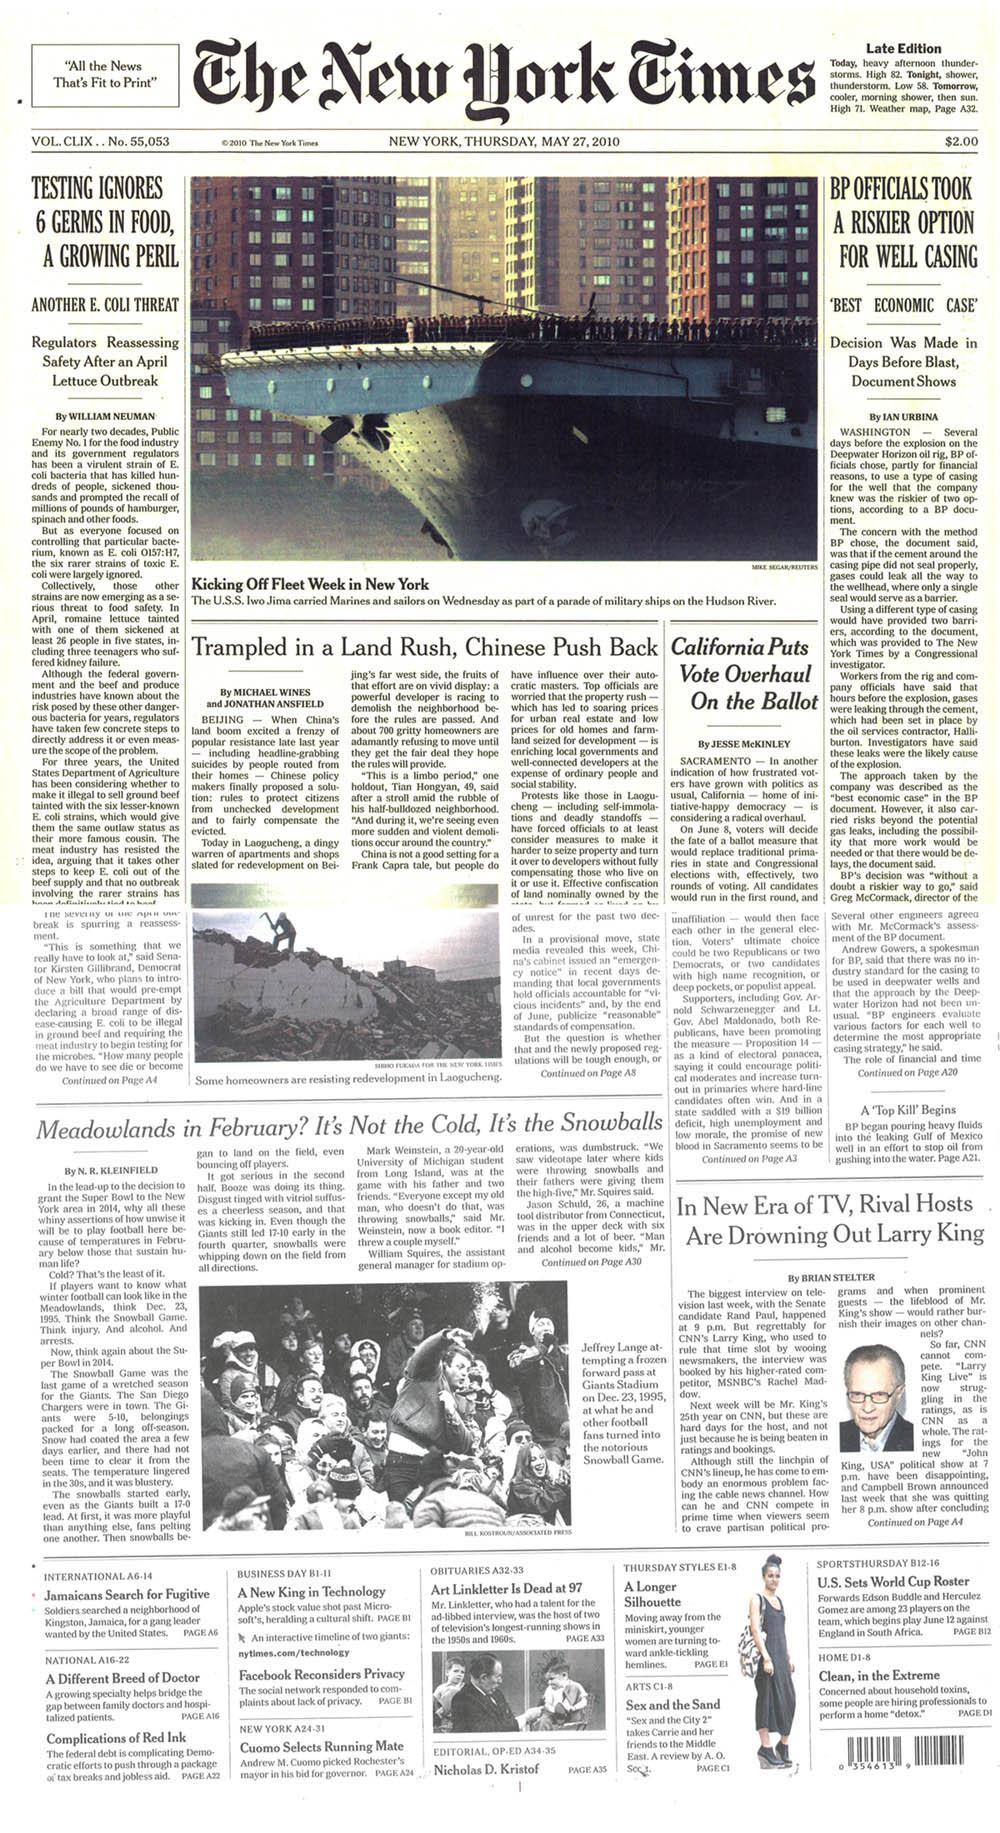 NY Times cover - edit 3.jpg